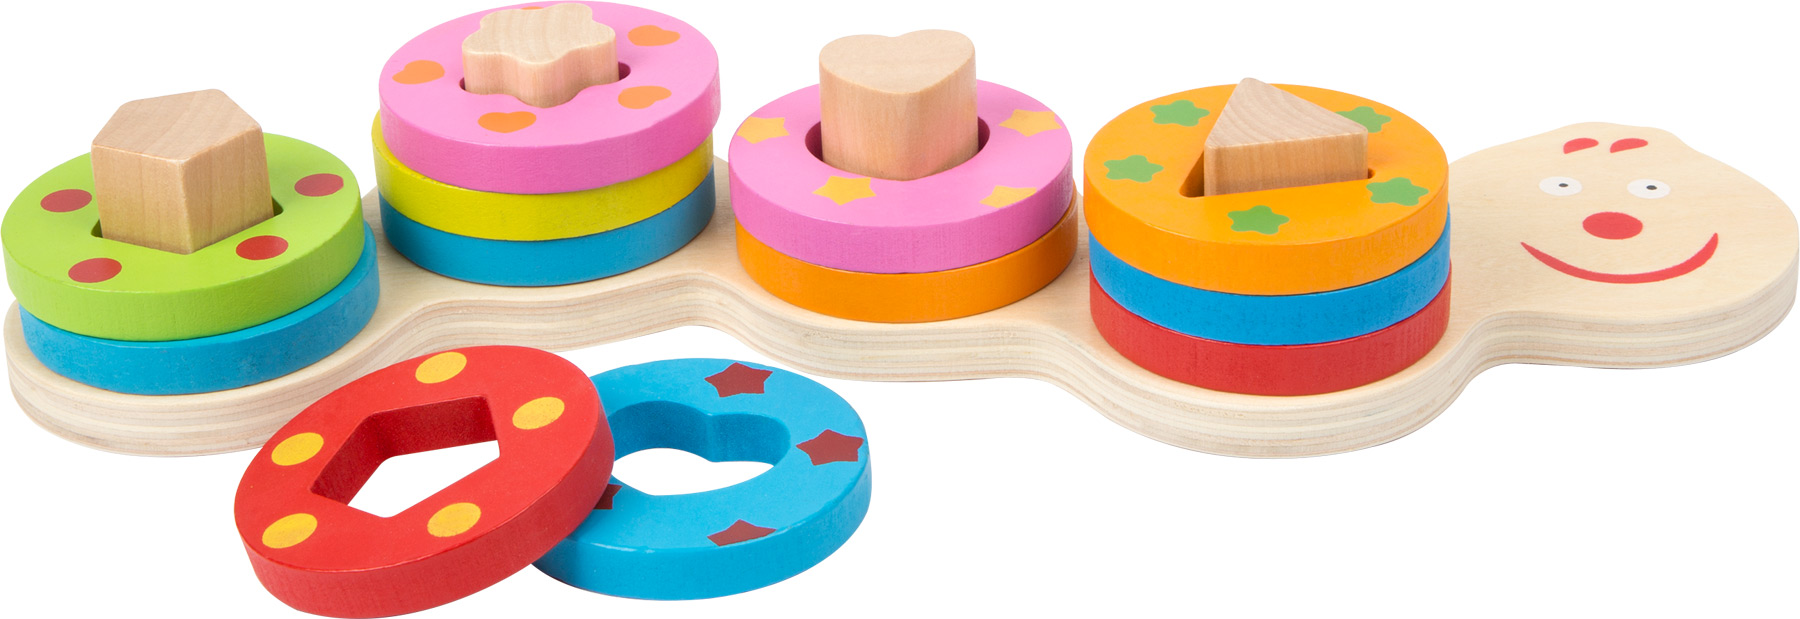 Legler small foot design Steckpuzzle Formen